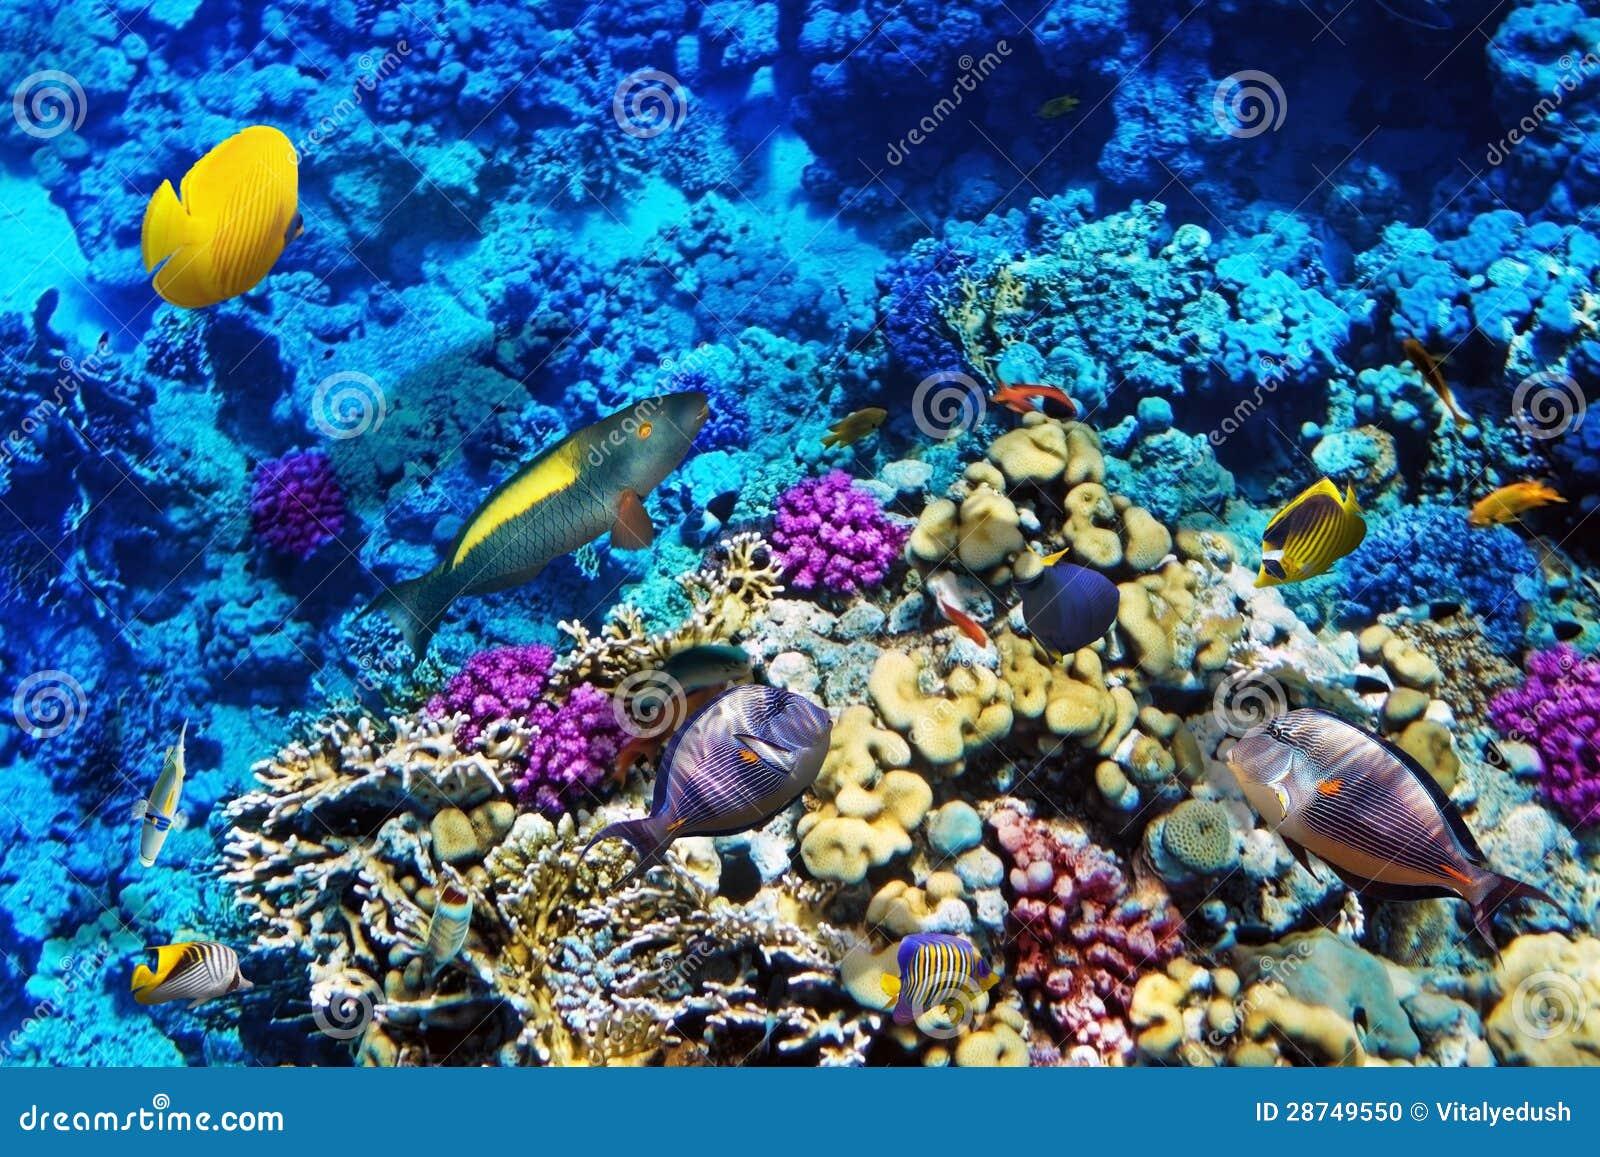 South Bay Aquarium